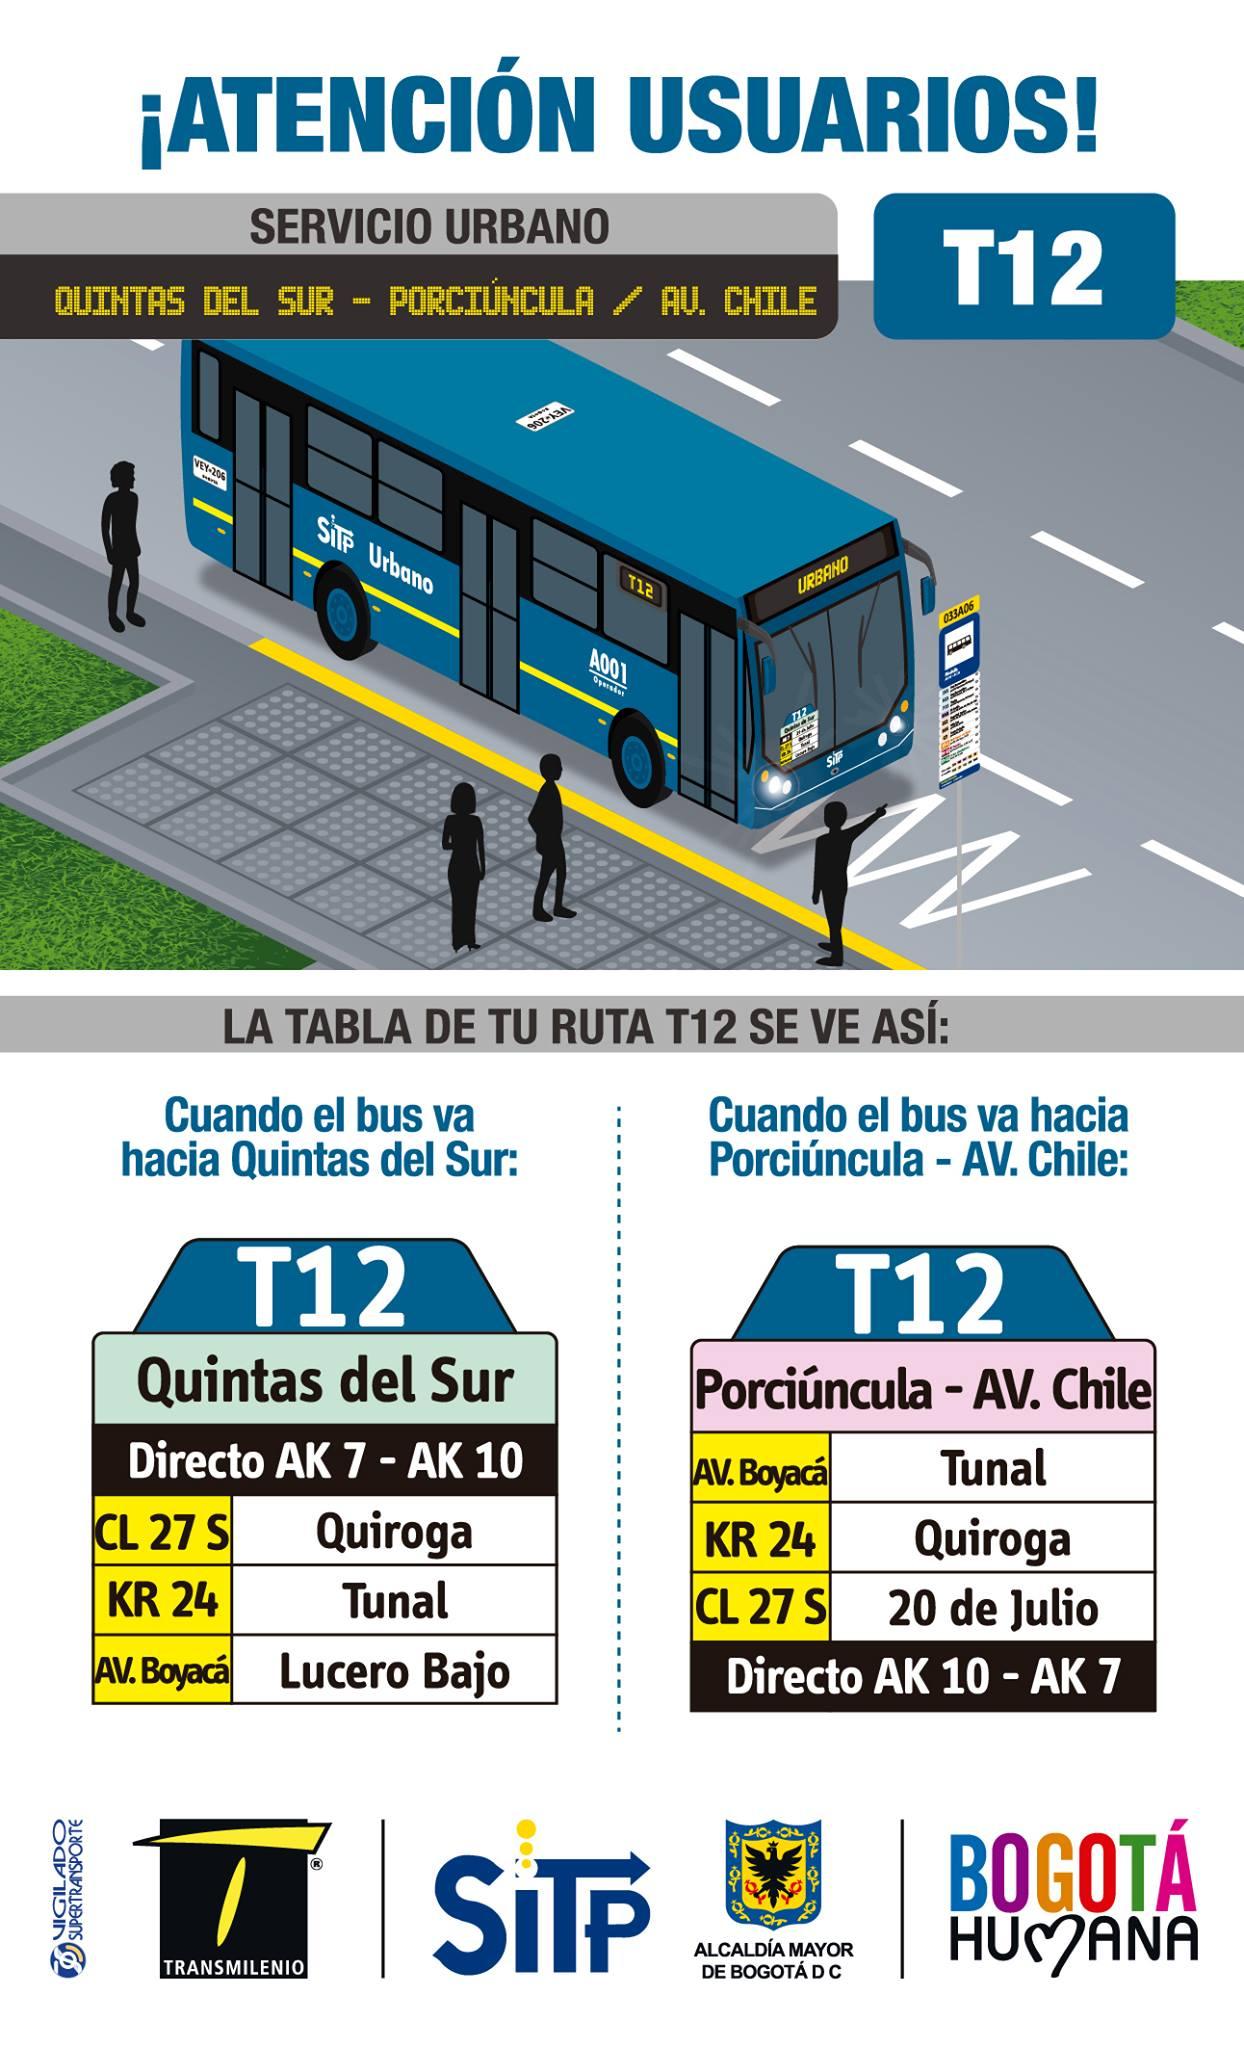 Nueva ruta T12 - Quintas del Sur / Porciúncula (Av. Chile)